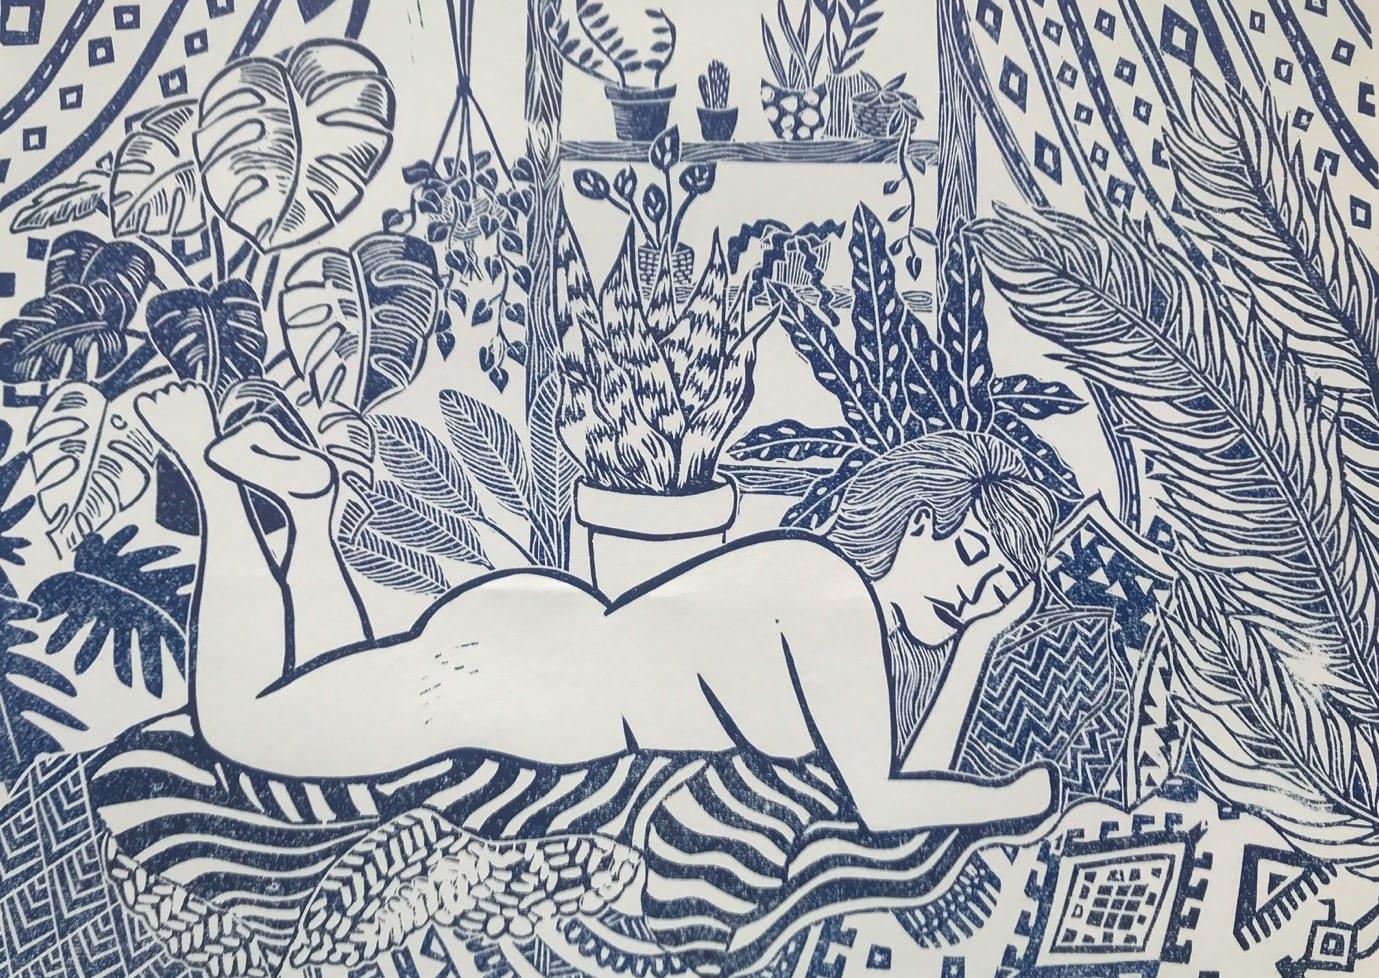 Lino print of naked lady lying amongst plants